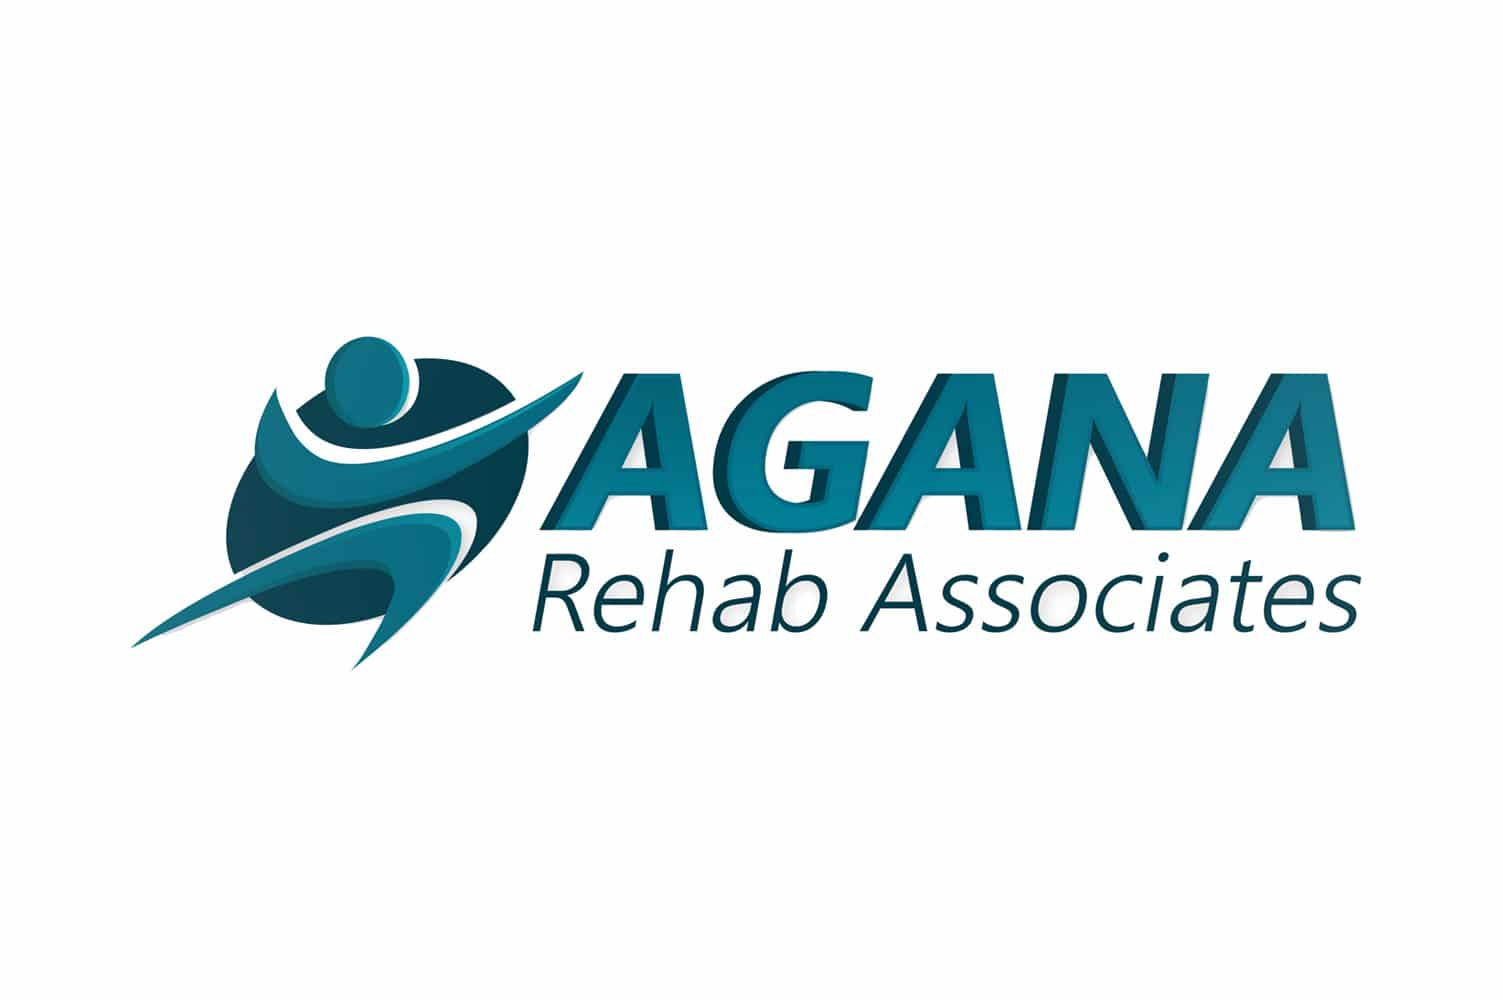 agana-rehab-associates-logo-design